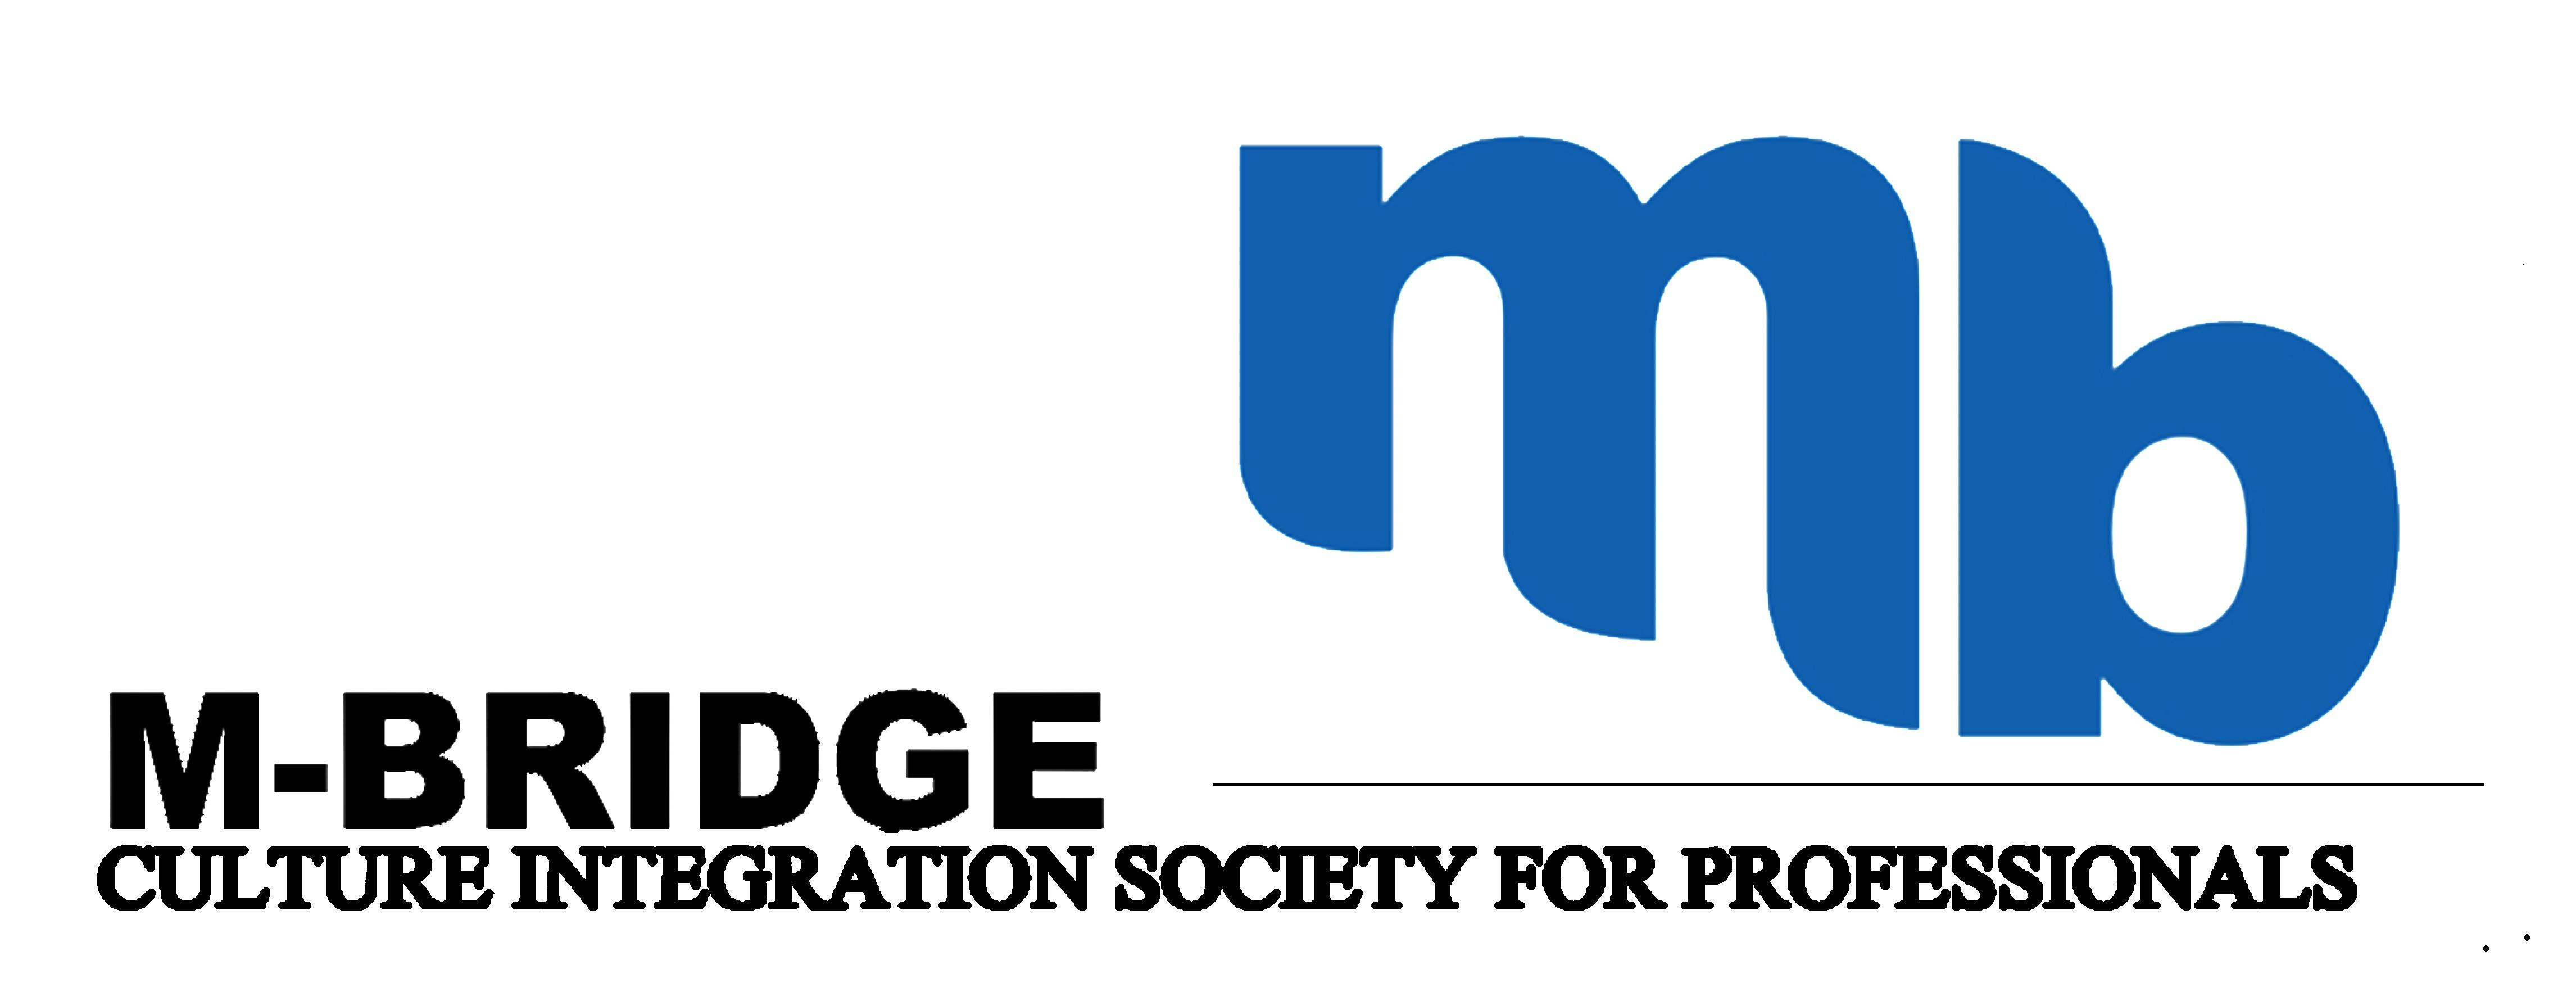 M-Bridge Integration Society for Professionals